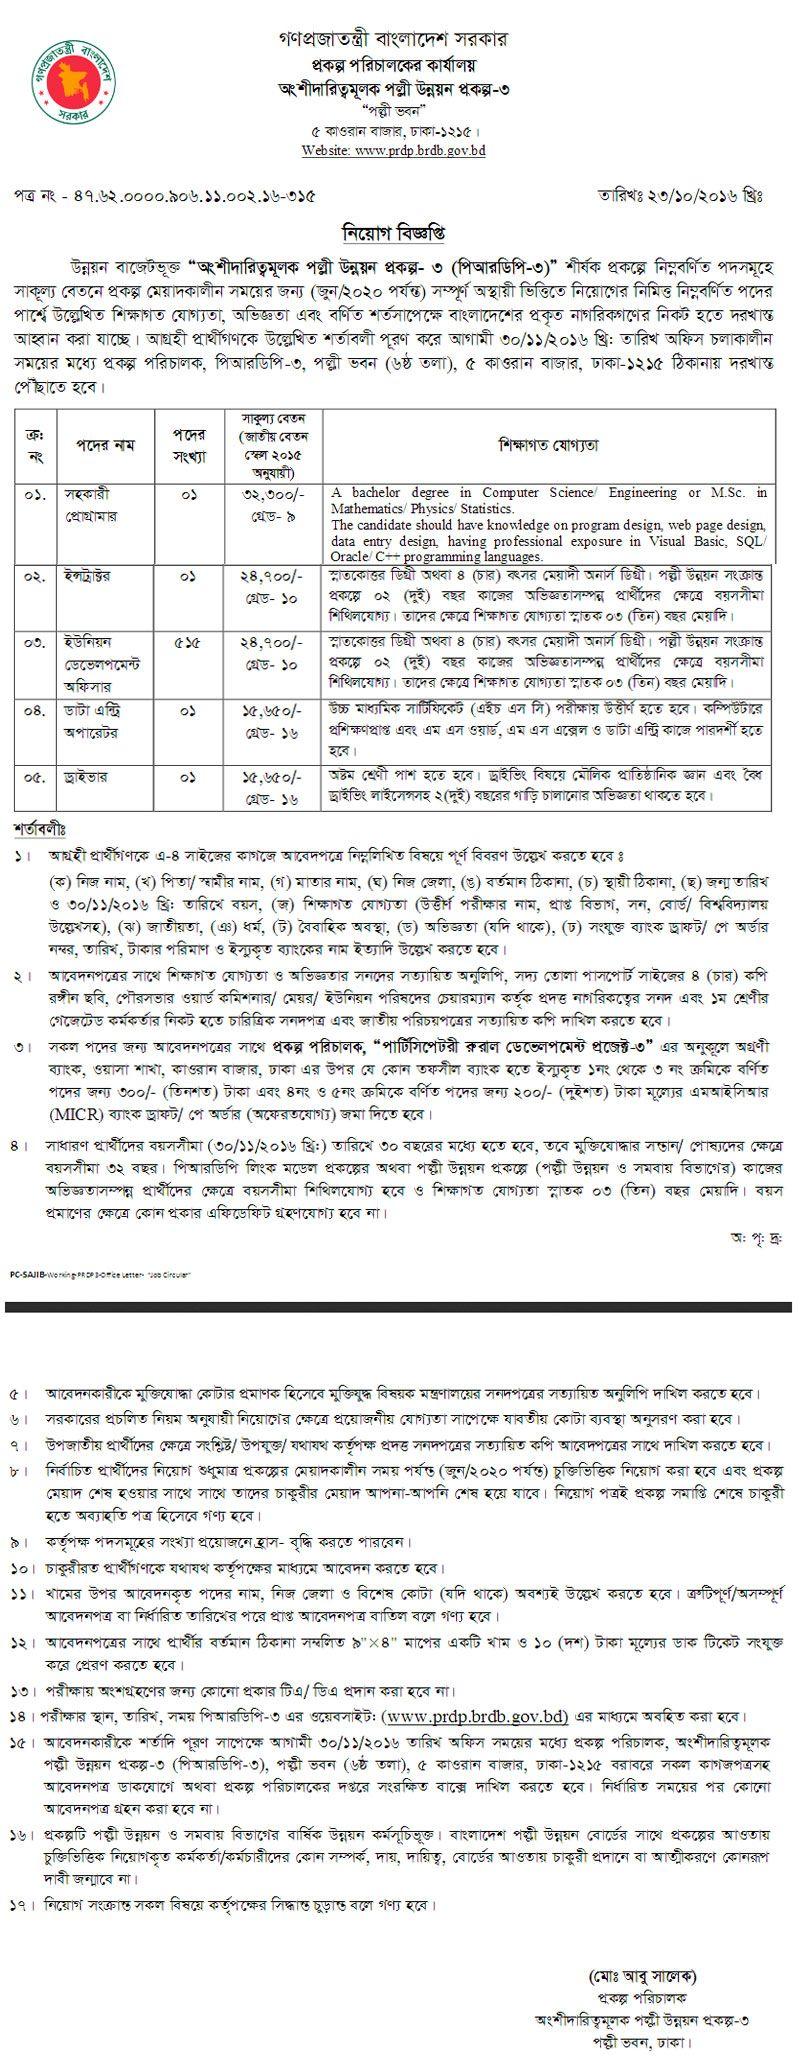 519 Vacancy Bangladesh Rural Development Board Job